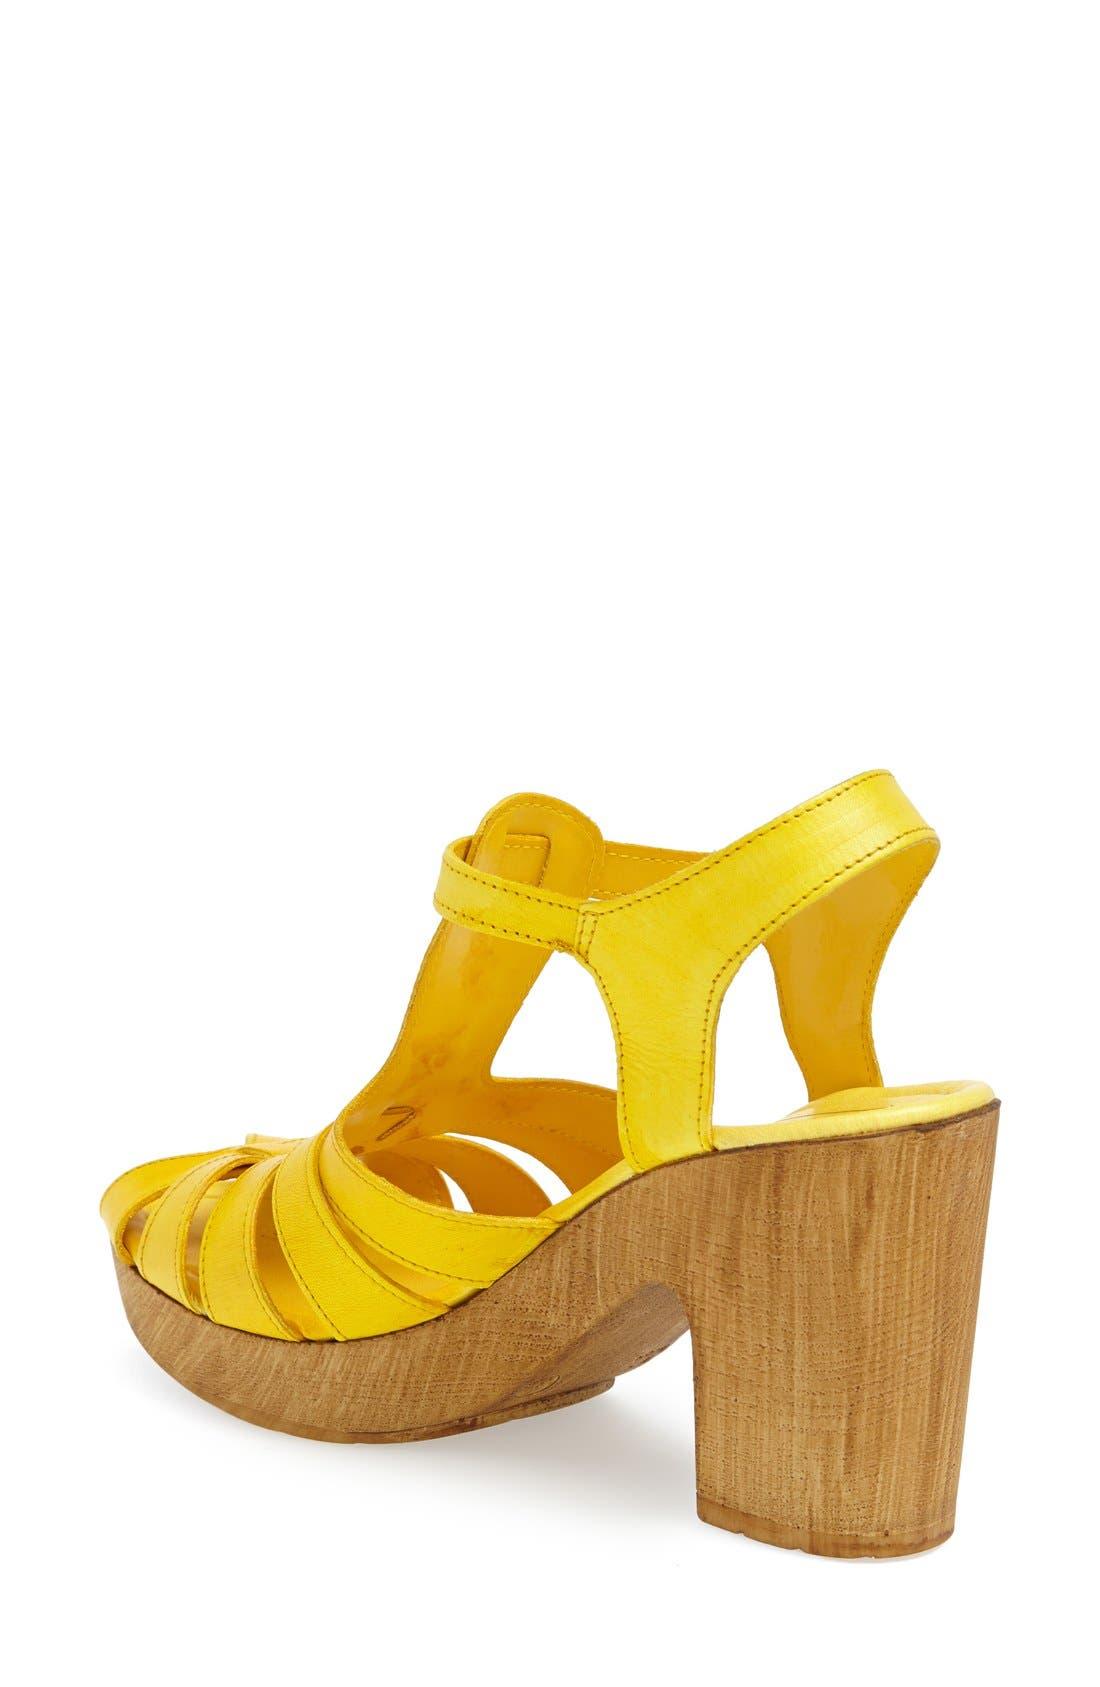 Alternate Image 2  - Topshop 'Notch' Strappy Sandal (Women)